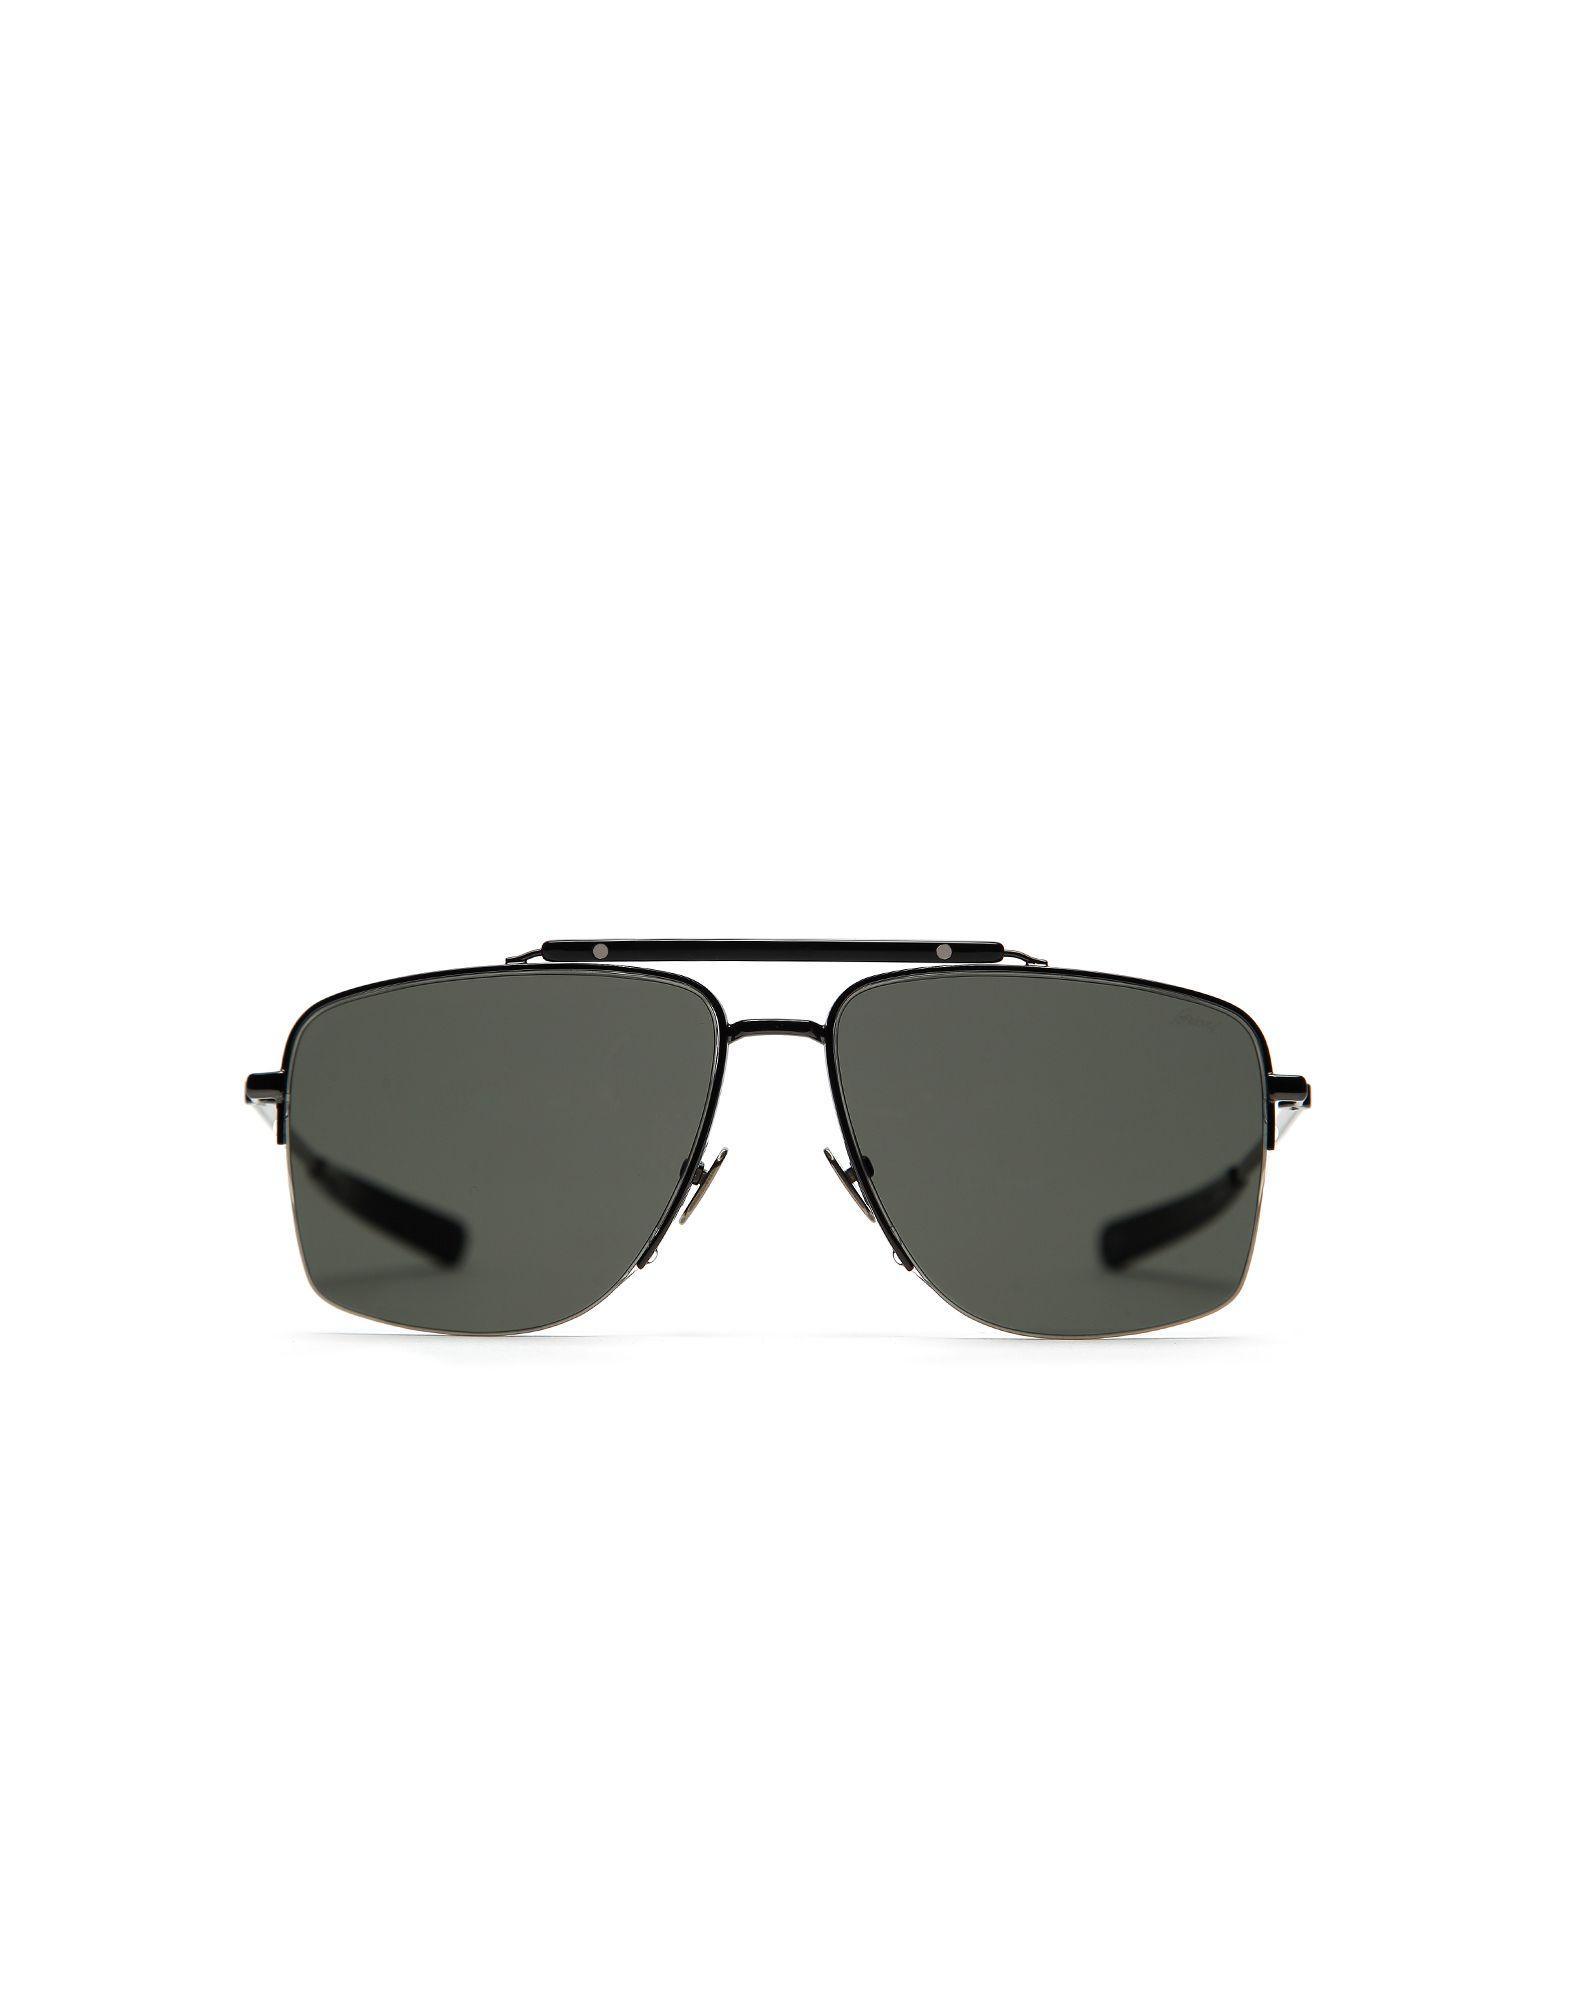 85de5e72a06b0 Elliot Square Sunglasses